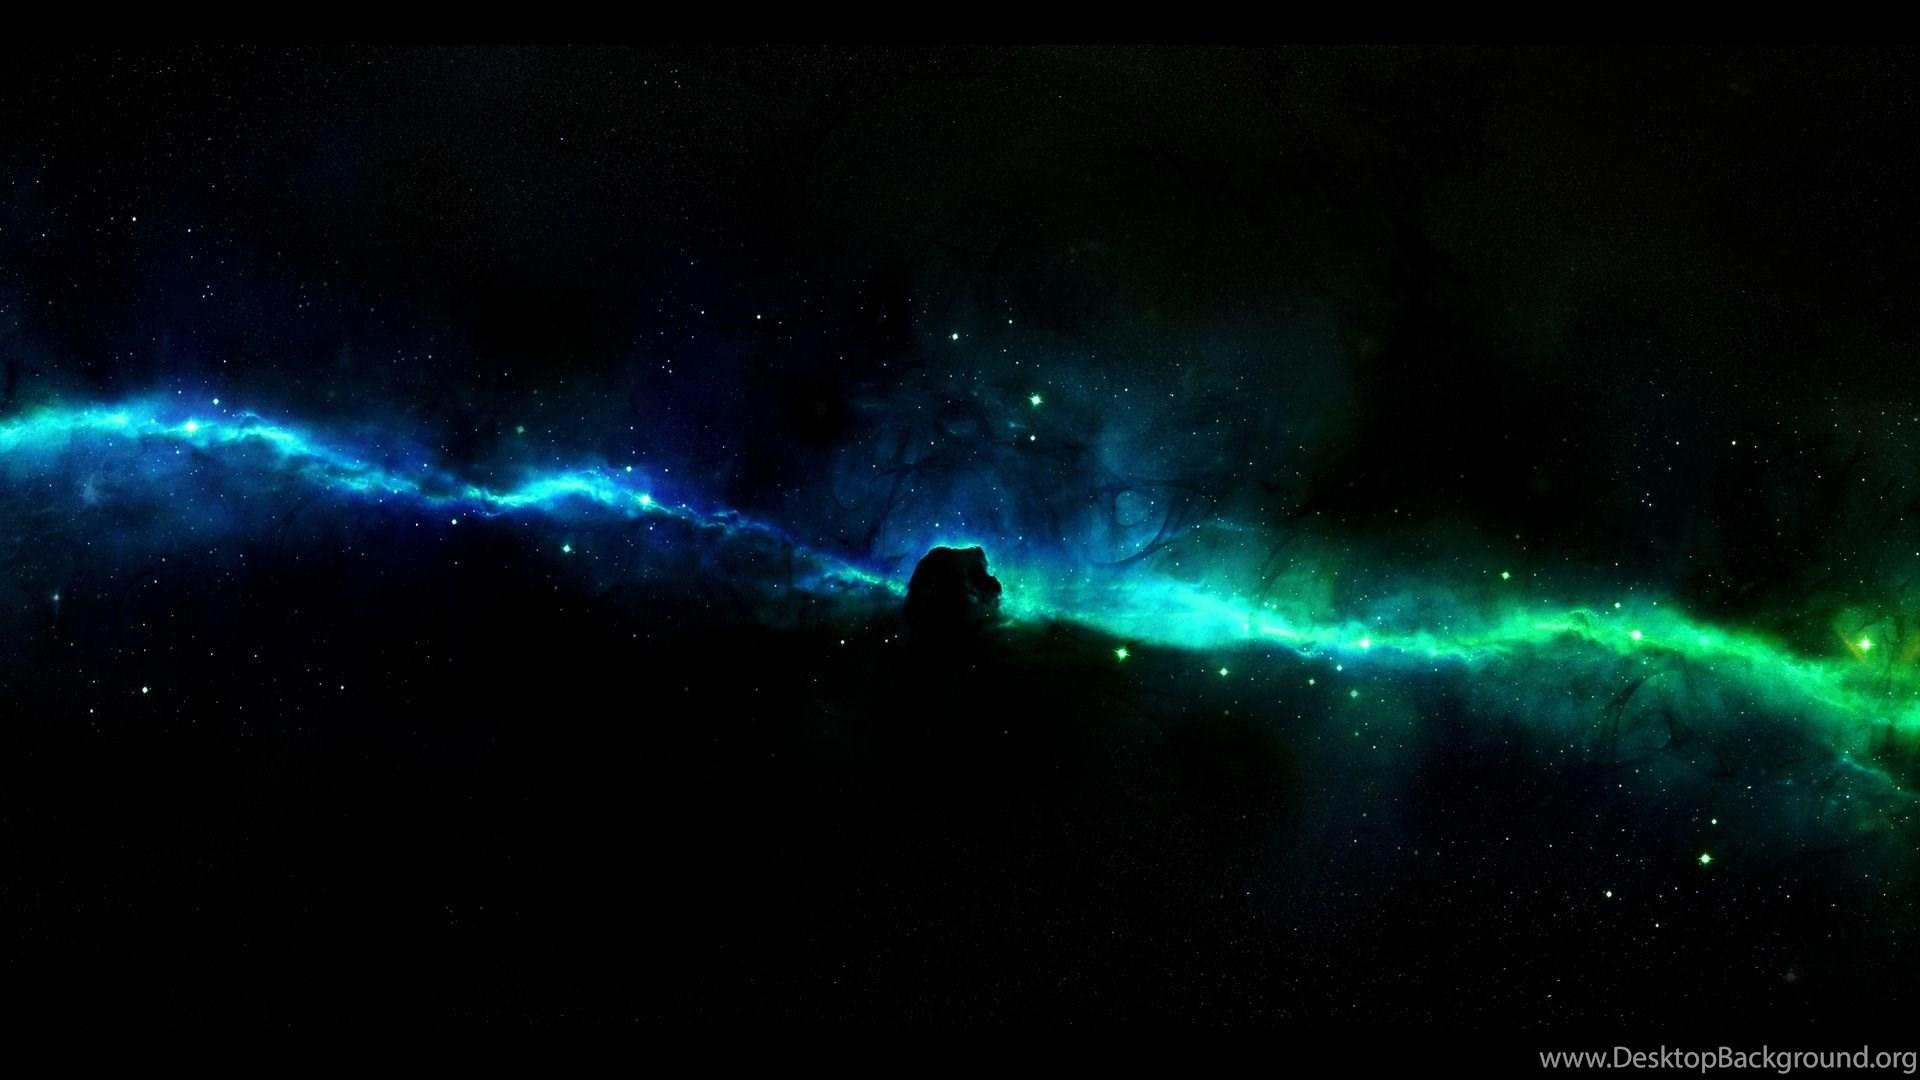 Beautiful Wallpaper High Resolution Nebula - 276055_green-high-resolution-nebula-wallpapers-page-4-pics-about-space_1920x1080_h  HD_55426.jpg